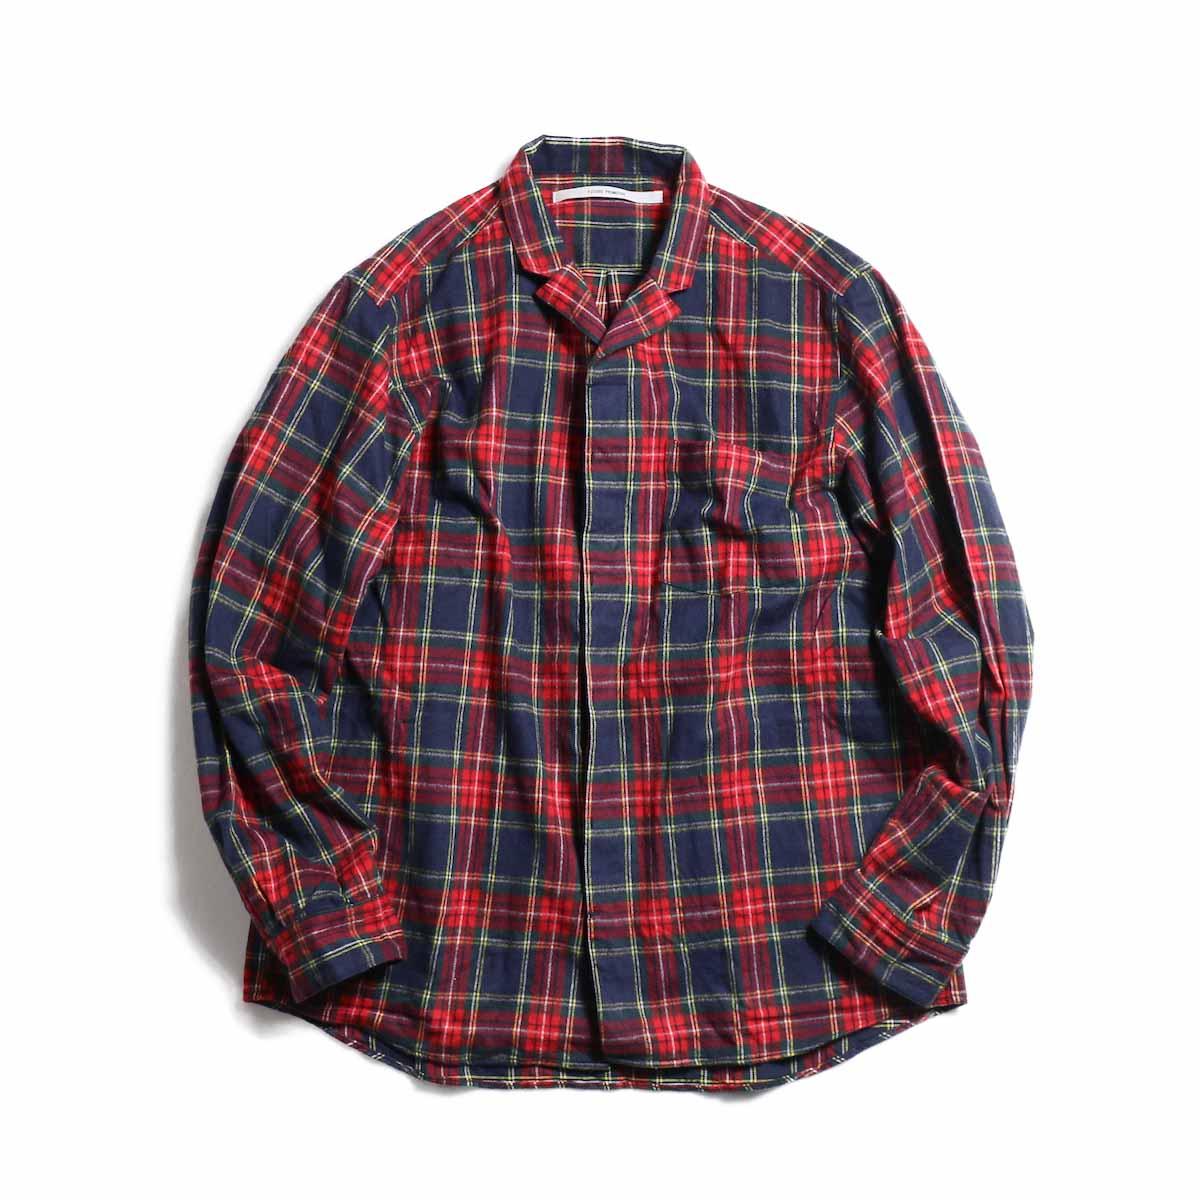 FUTURE PRIMITIVE / FP Notched Shirt(Tartan) -Navy